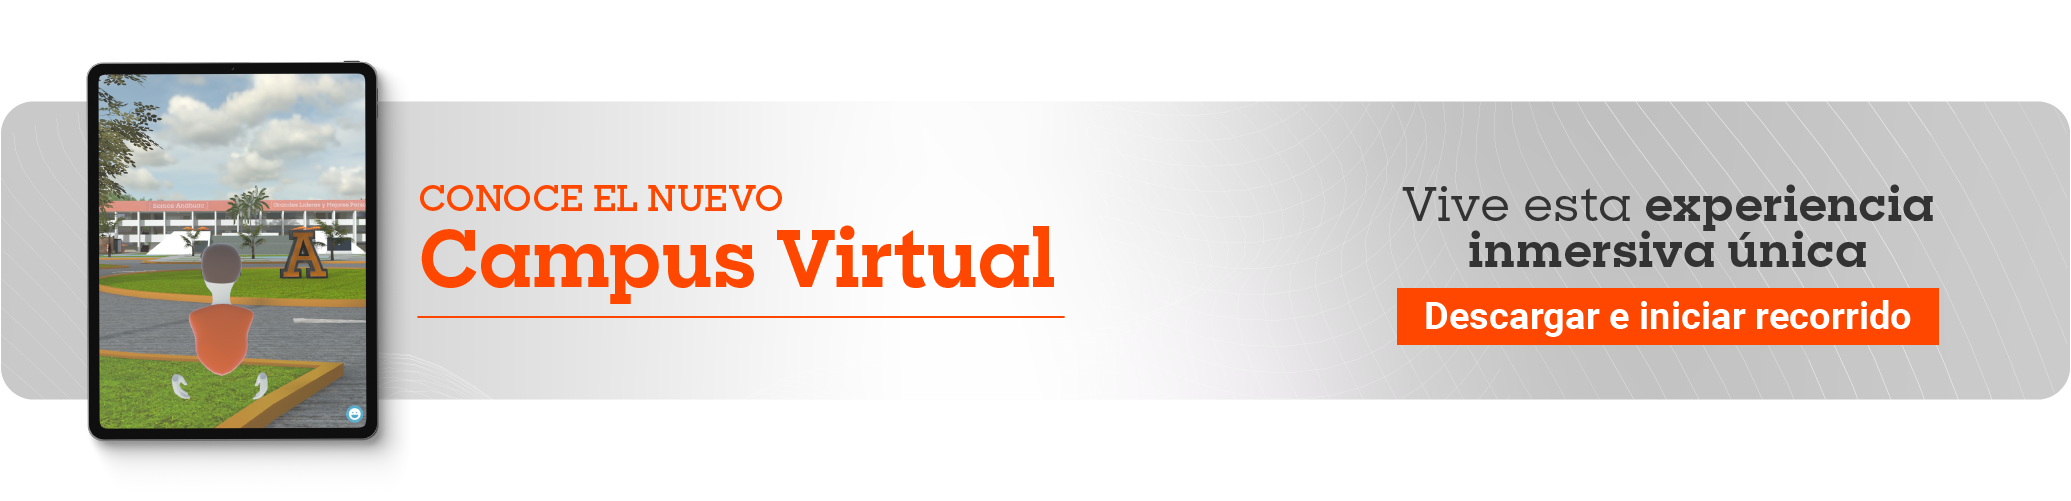 Campus Virtual_descarga